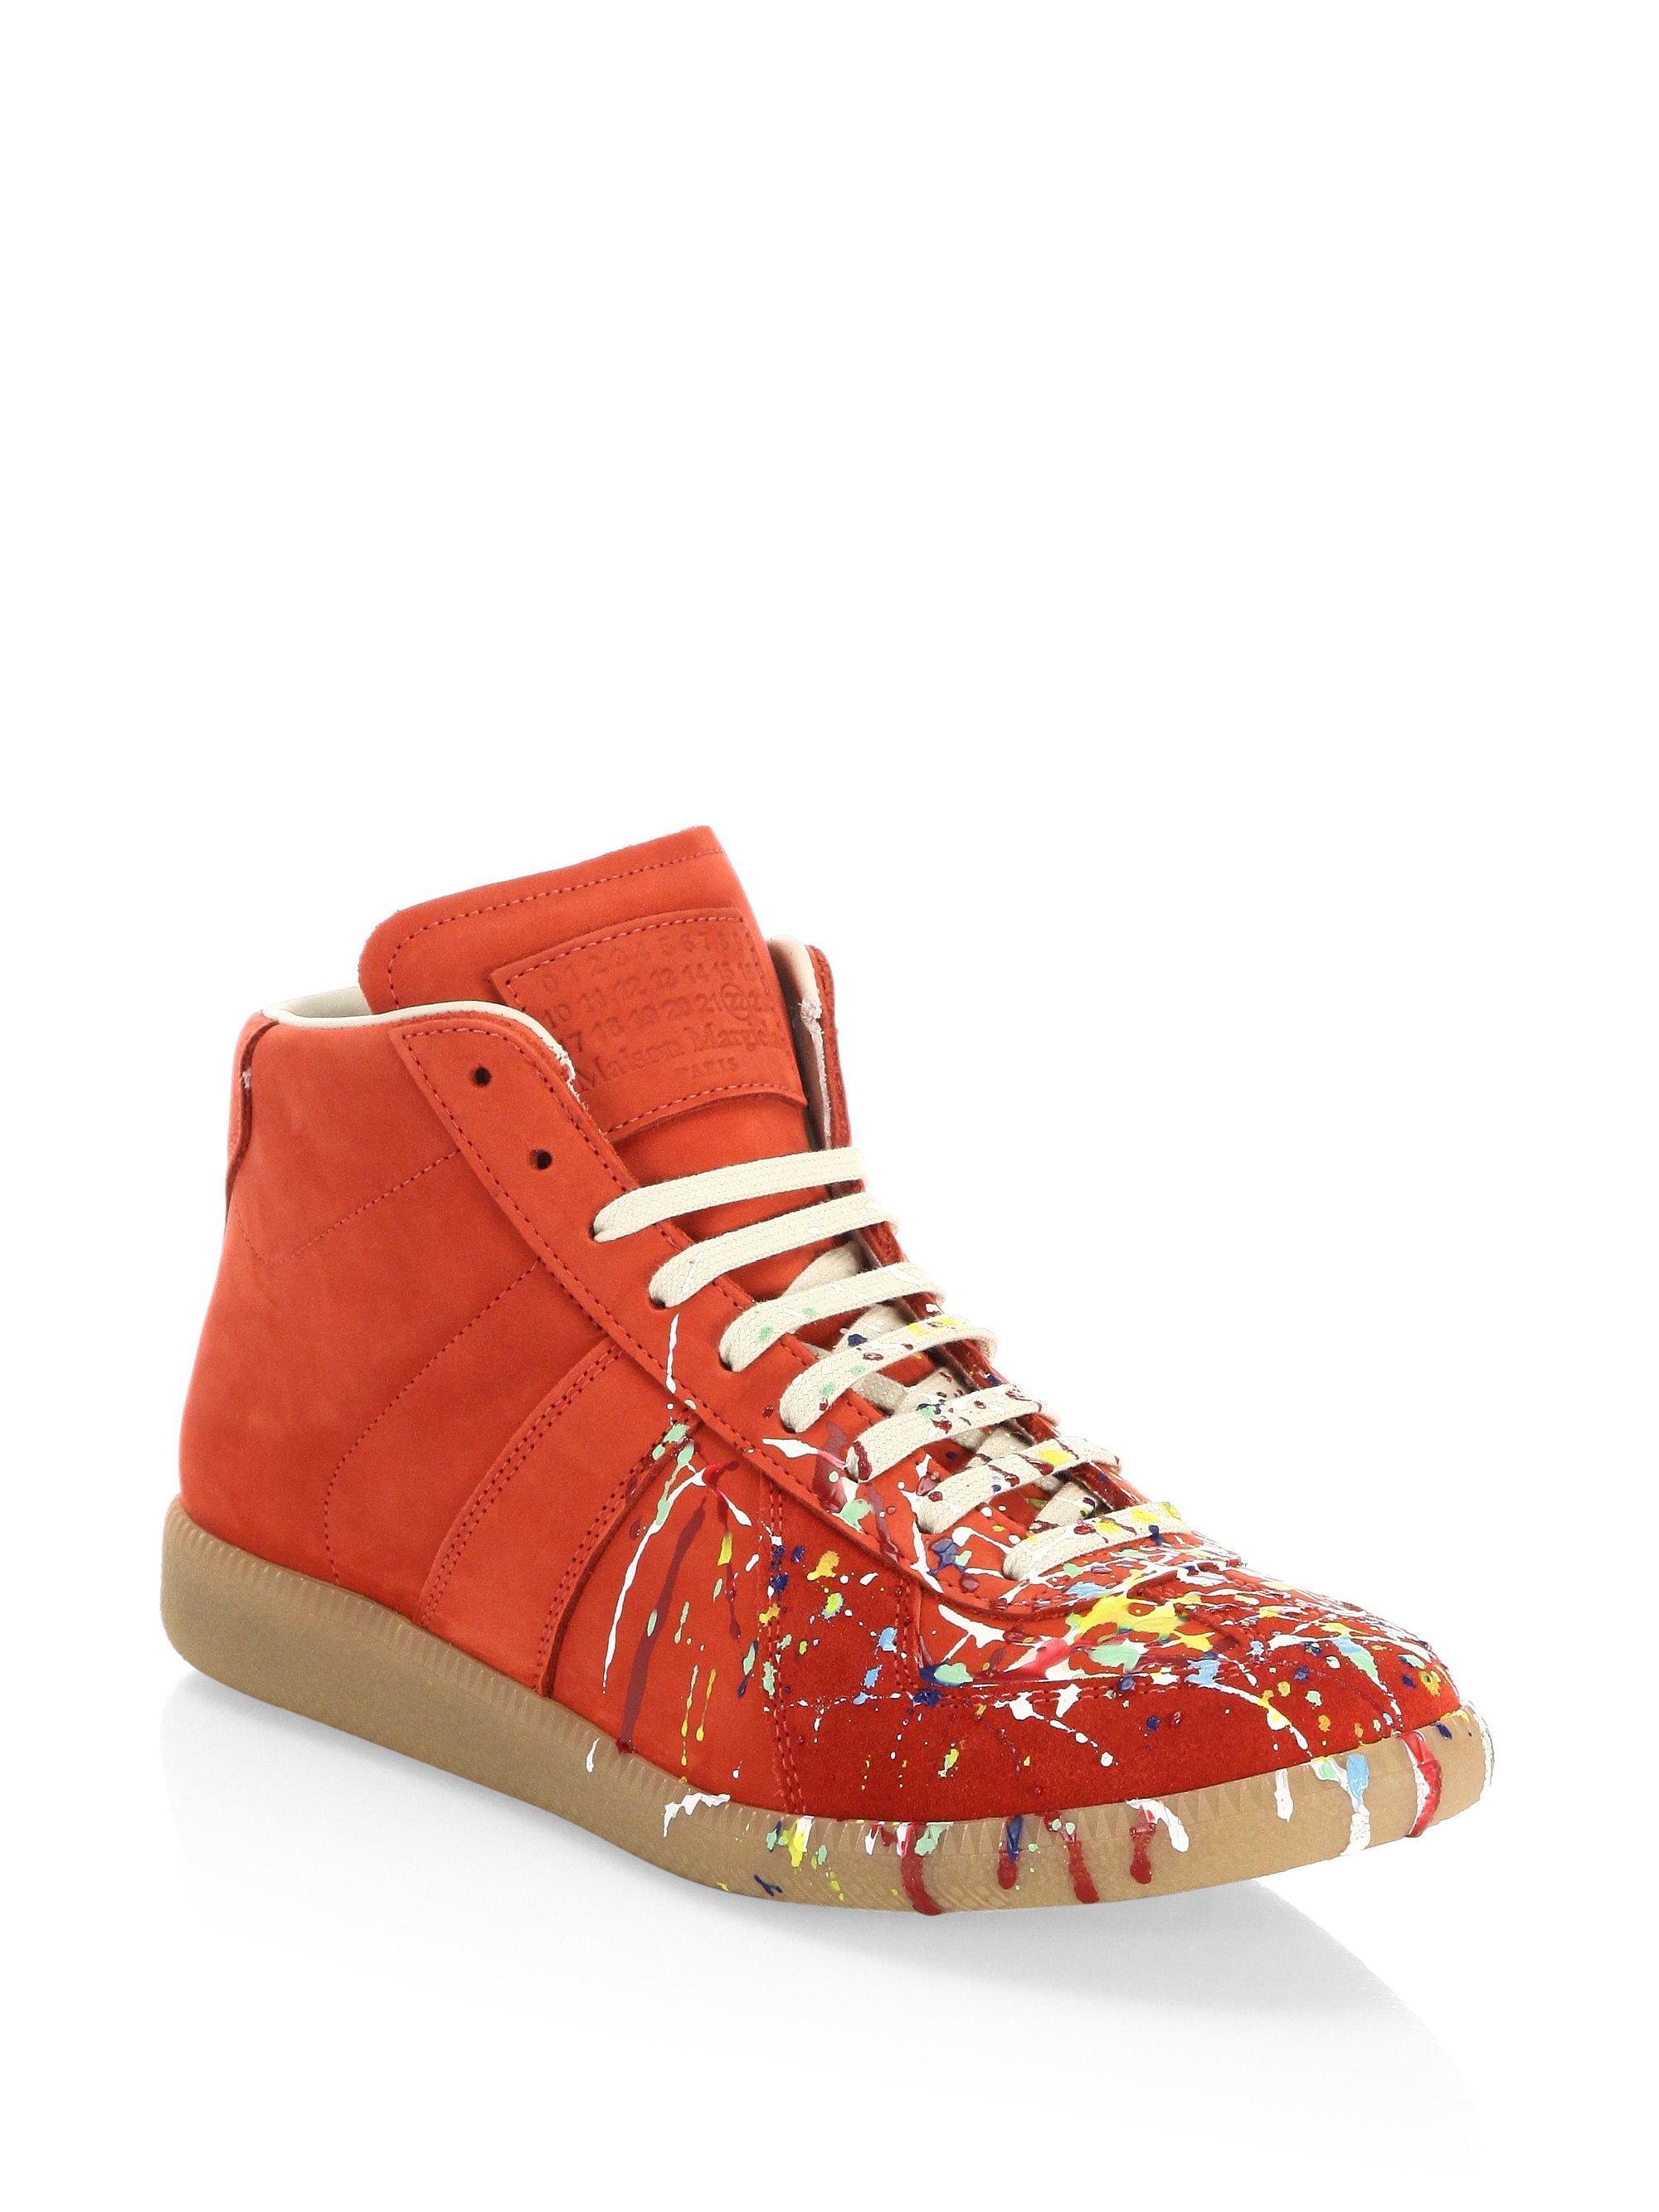 6ed064764f64 Maison Margiela Paint Splatter Replica Sneakers in Red for Men - Lyst